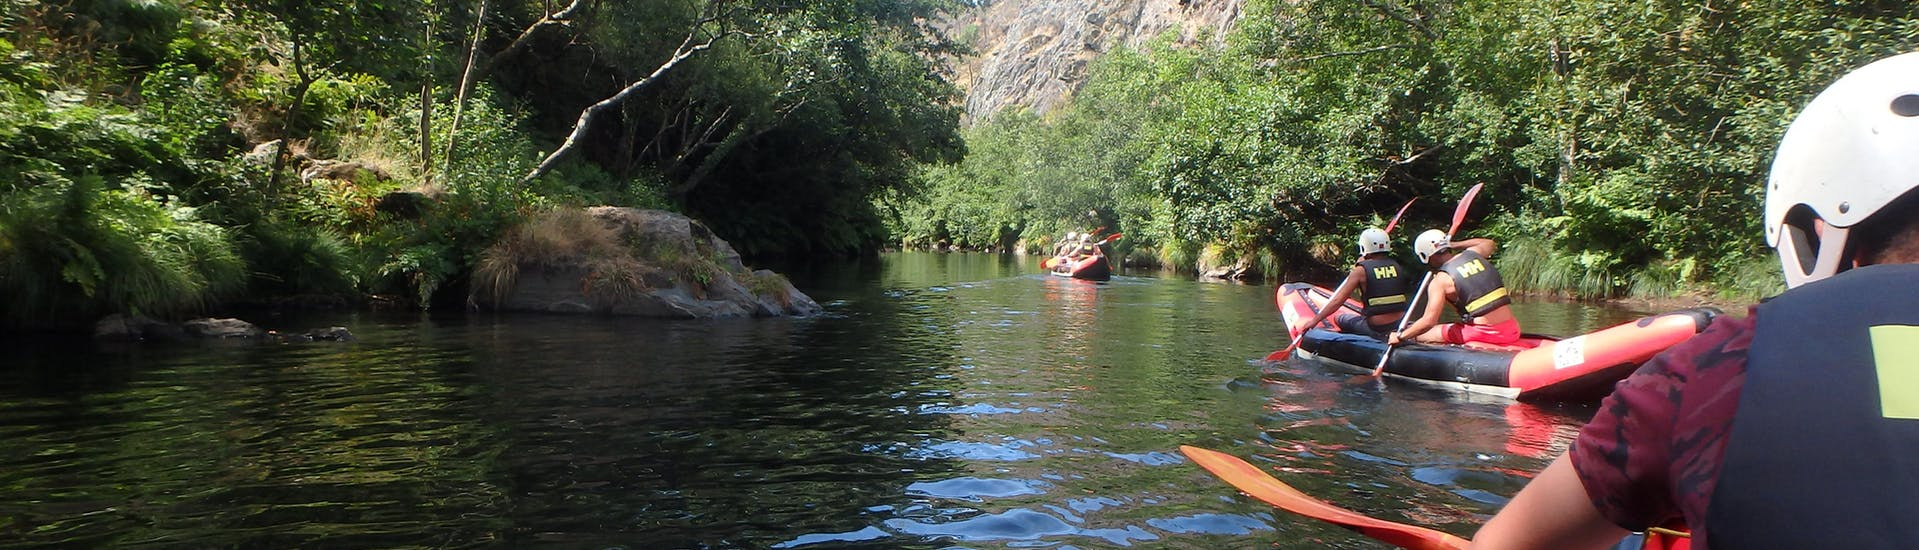 "Rafting ""Canoa Raft Tour"" - Paiva River"